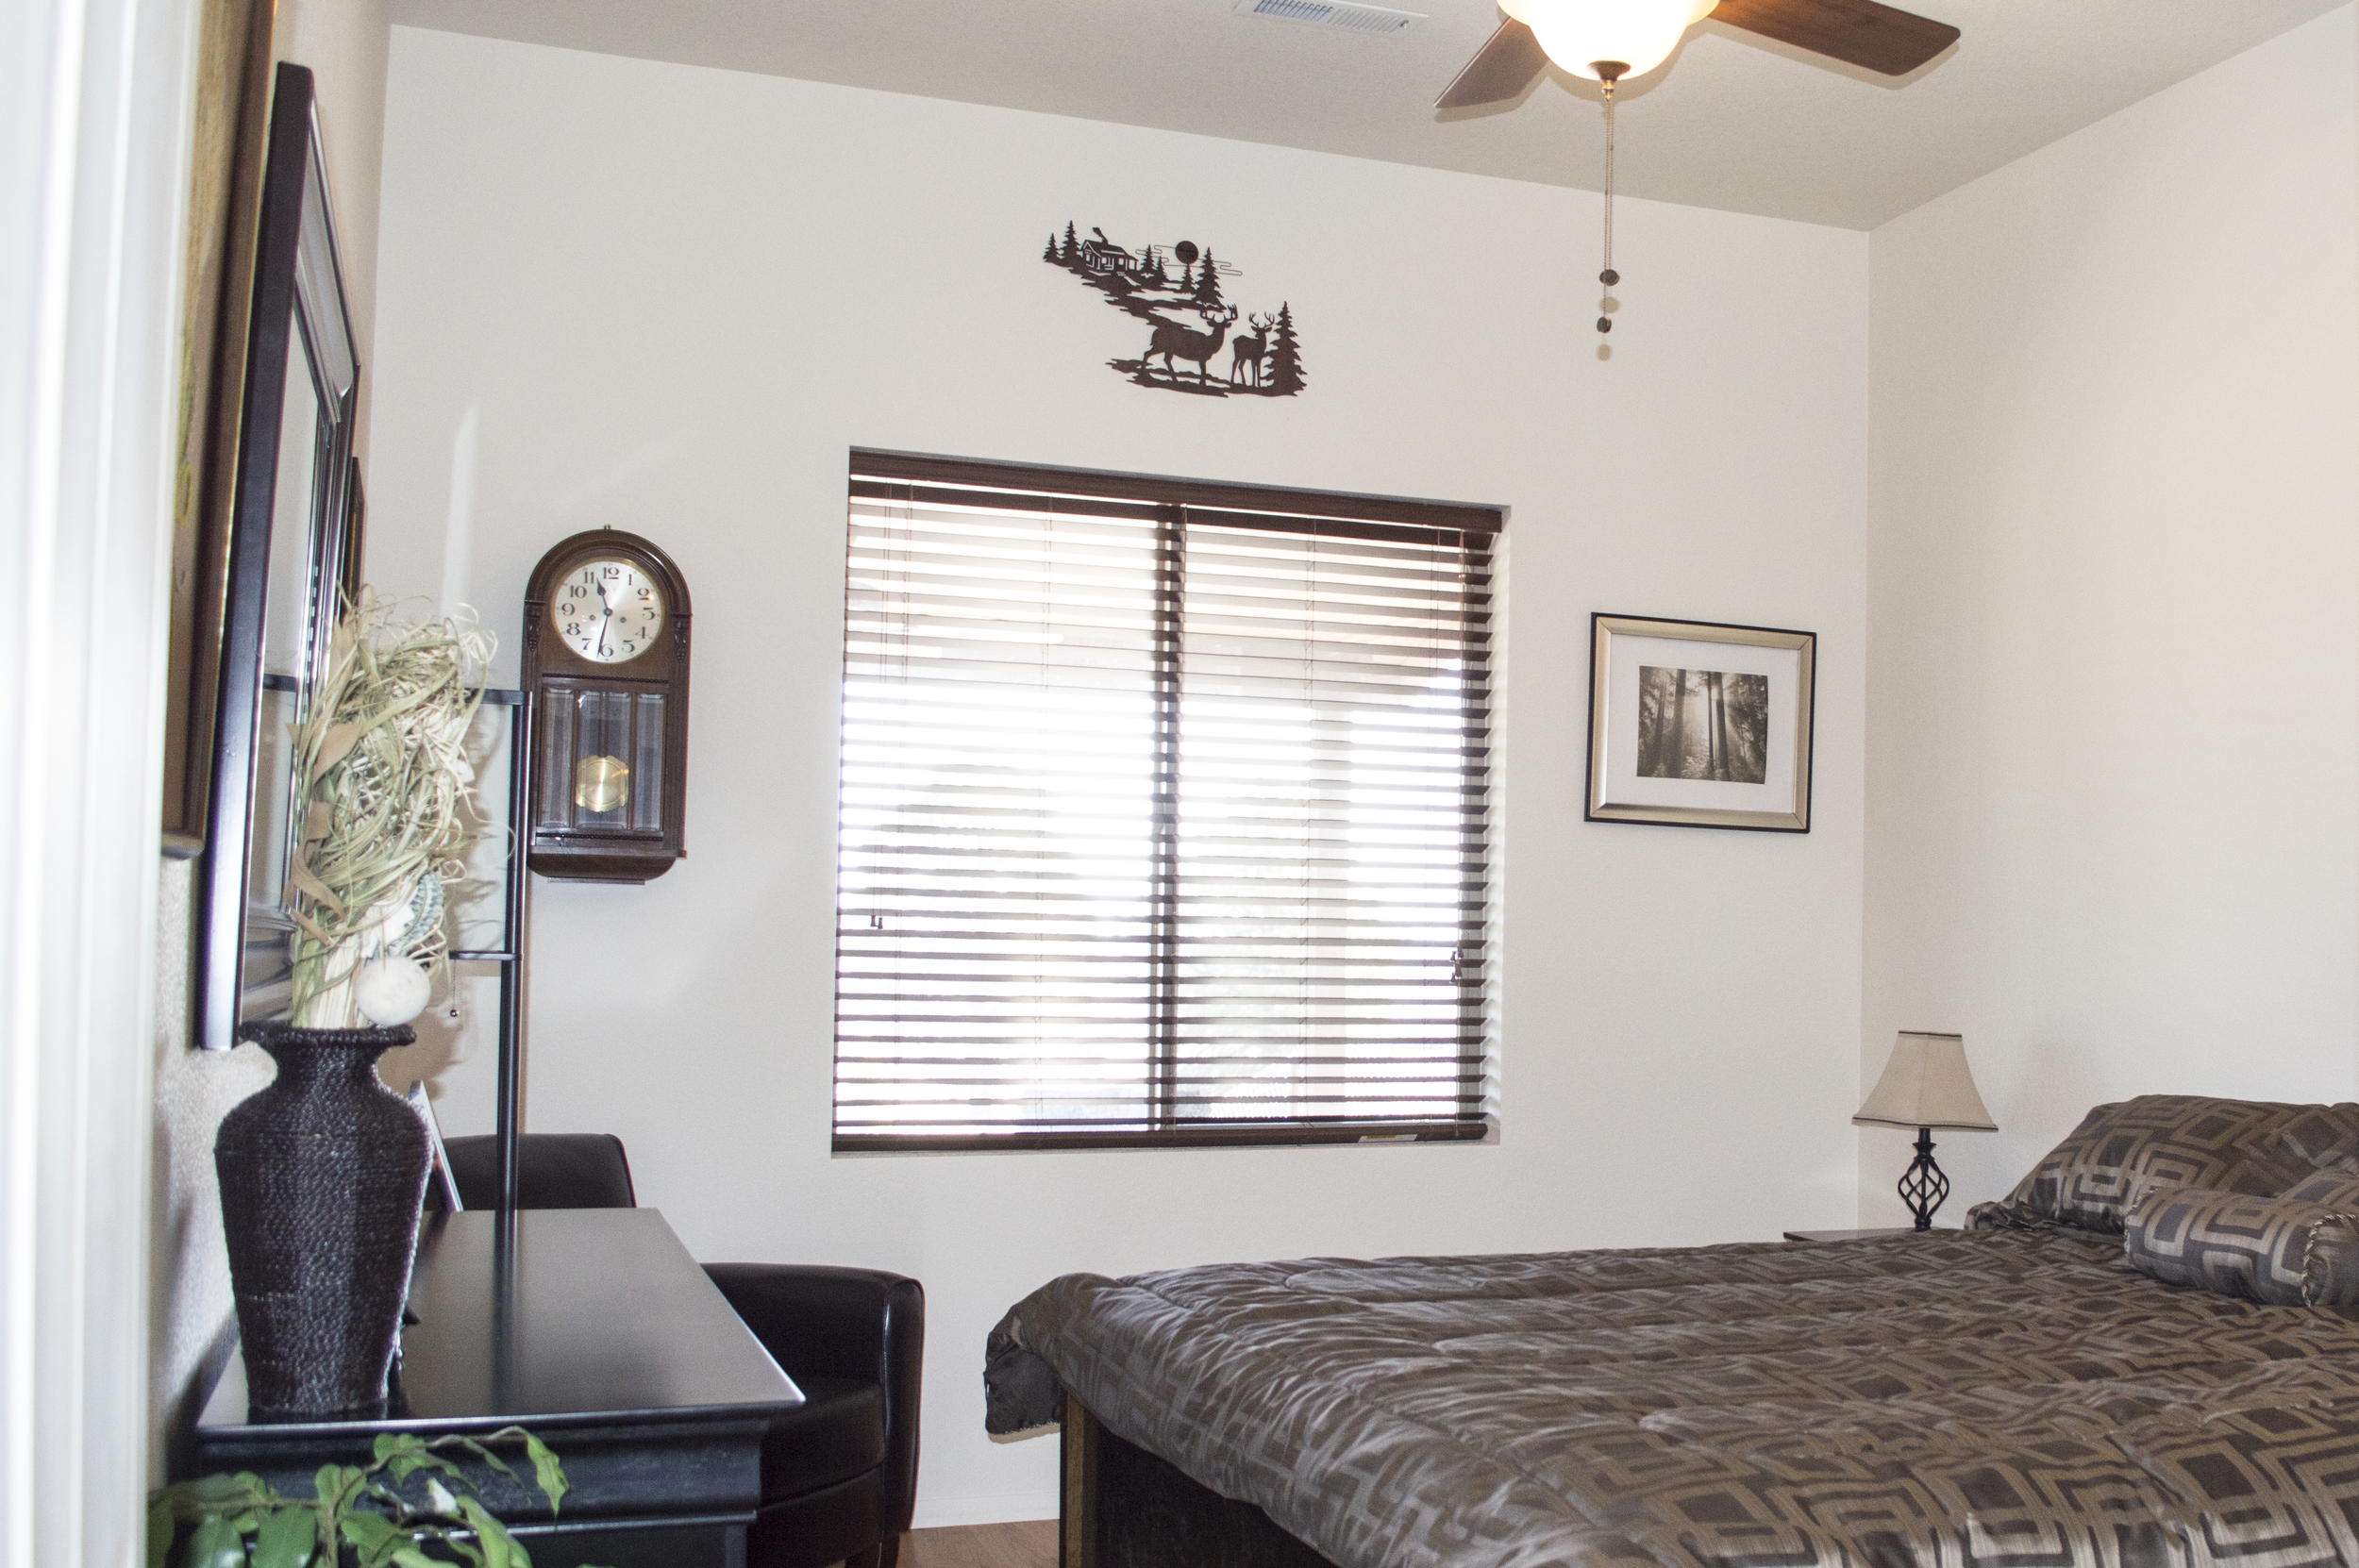 Bedroom of a residential custom home near Flagstaff, Arizona.